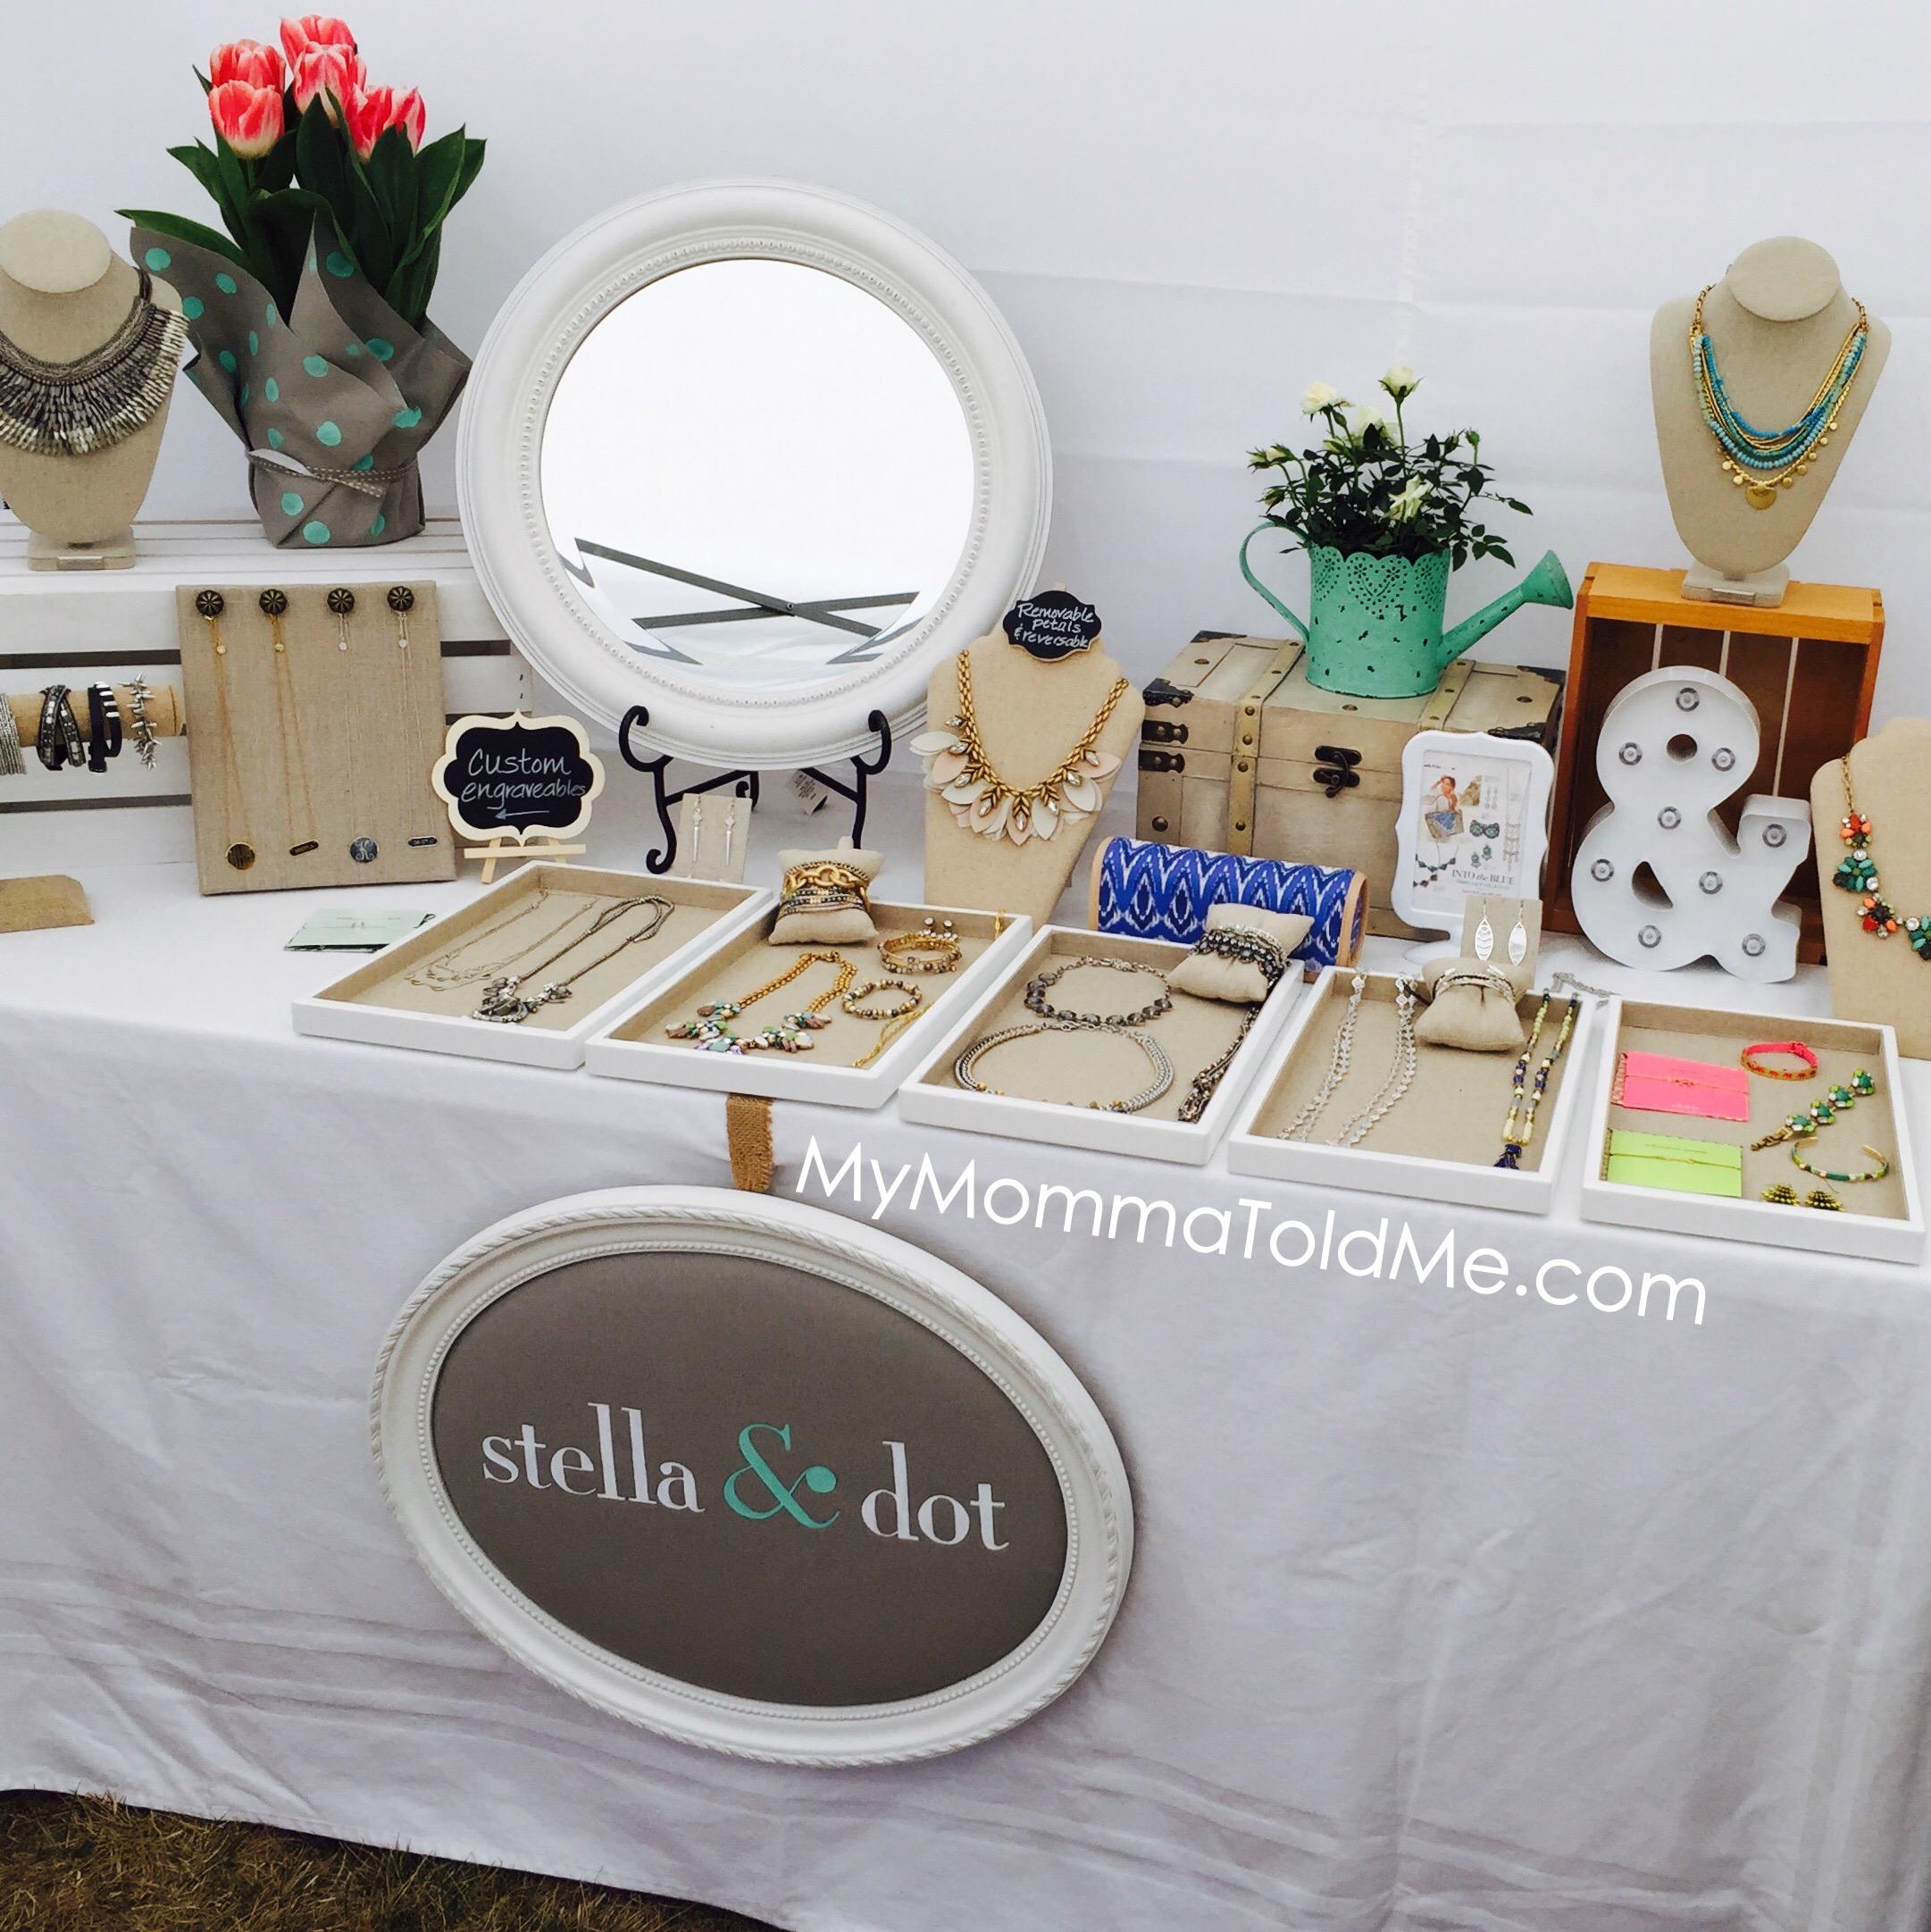 Stella & Dot Vendor Evnet Set Up Trunk Show Display Ideas MyMommaToldMe.com